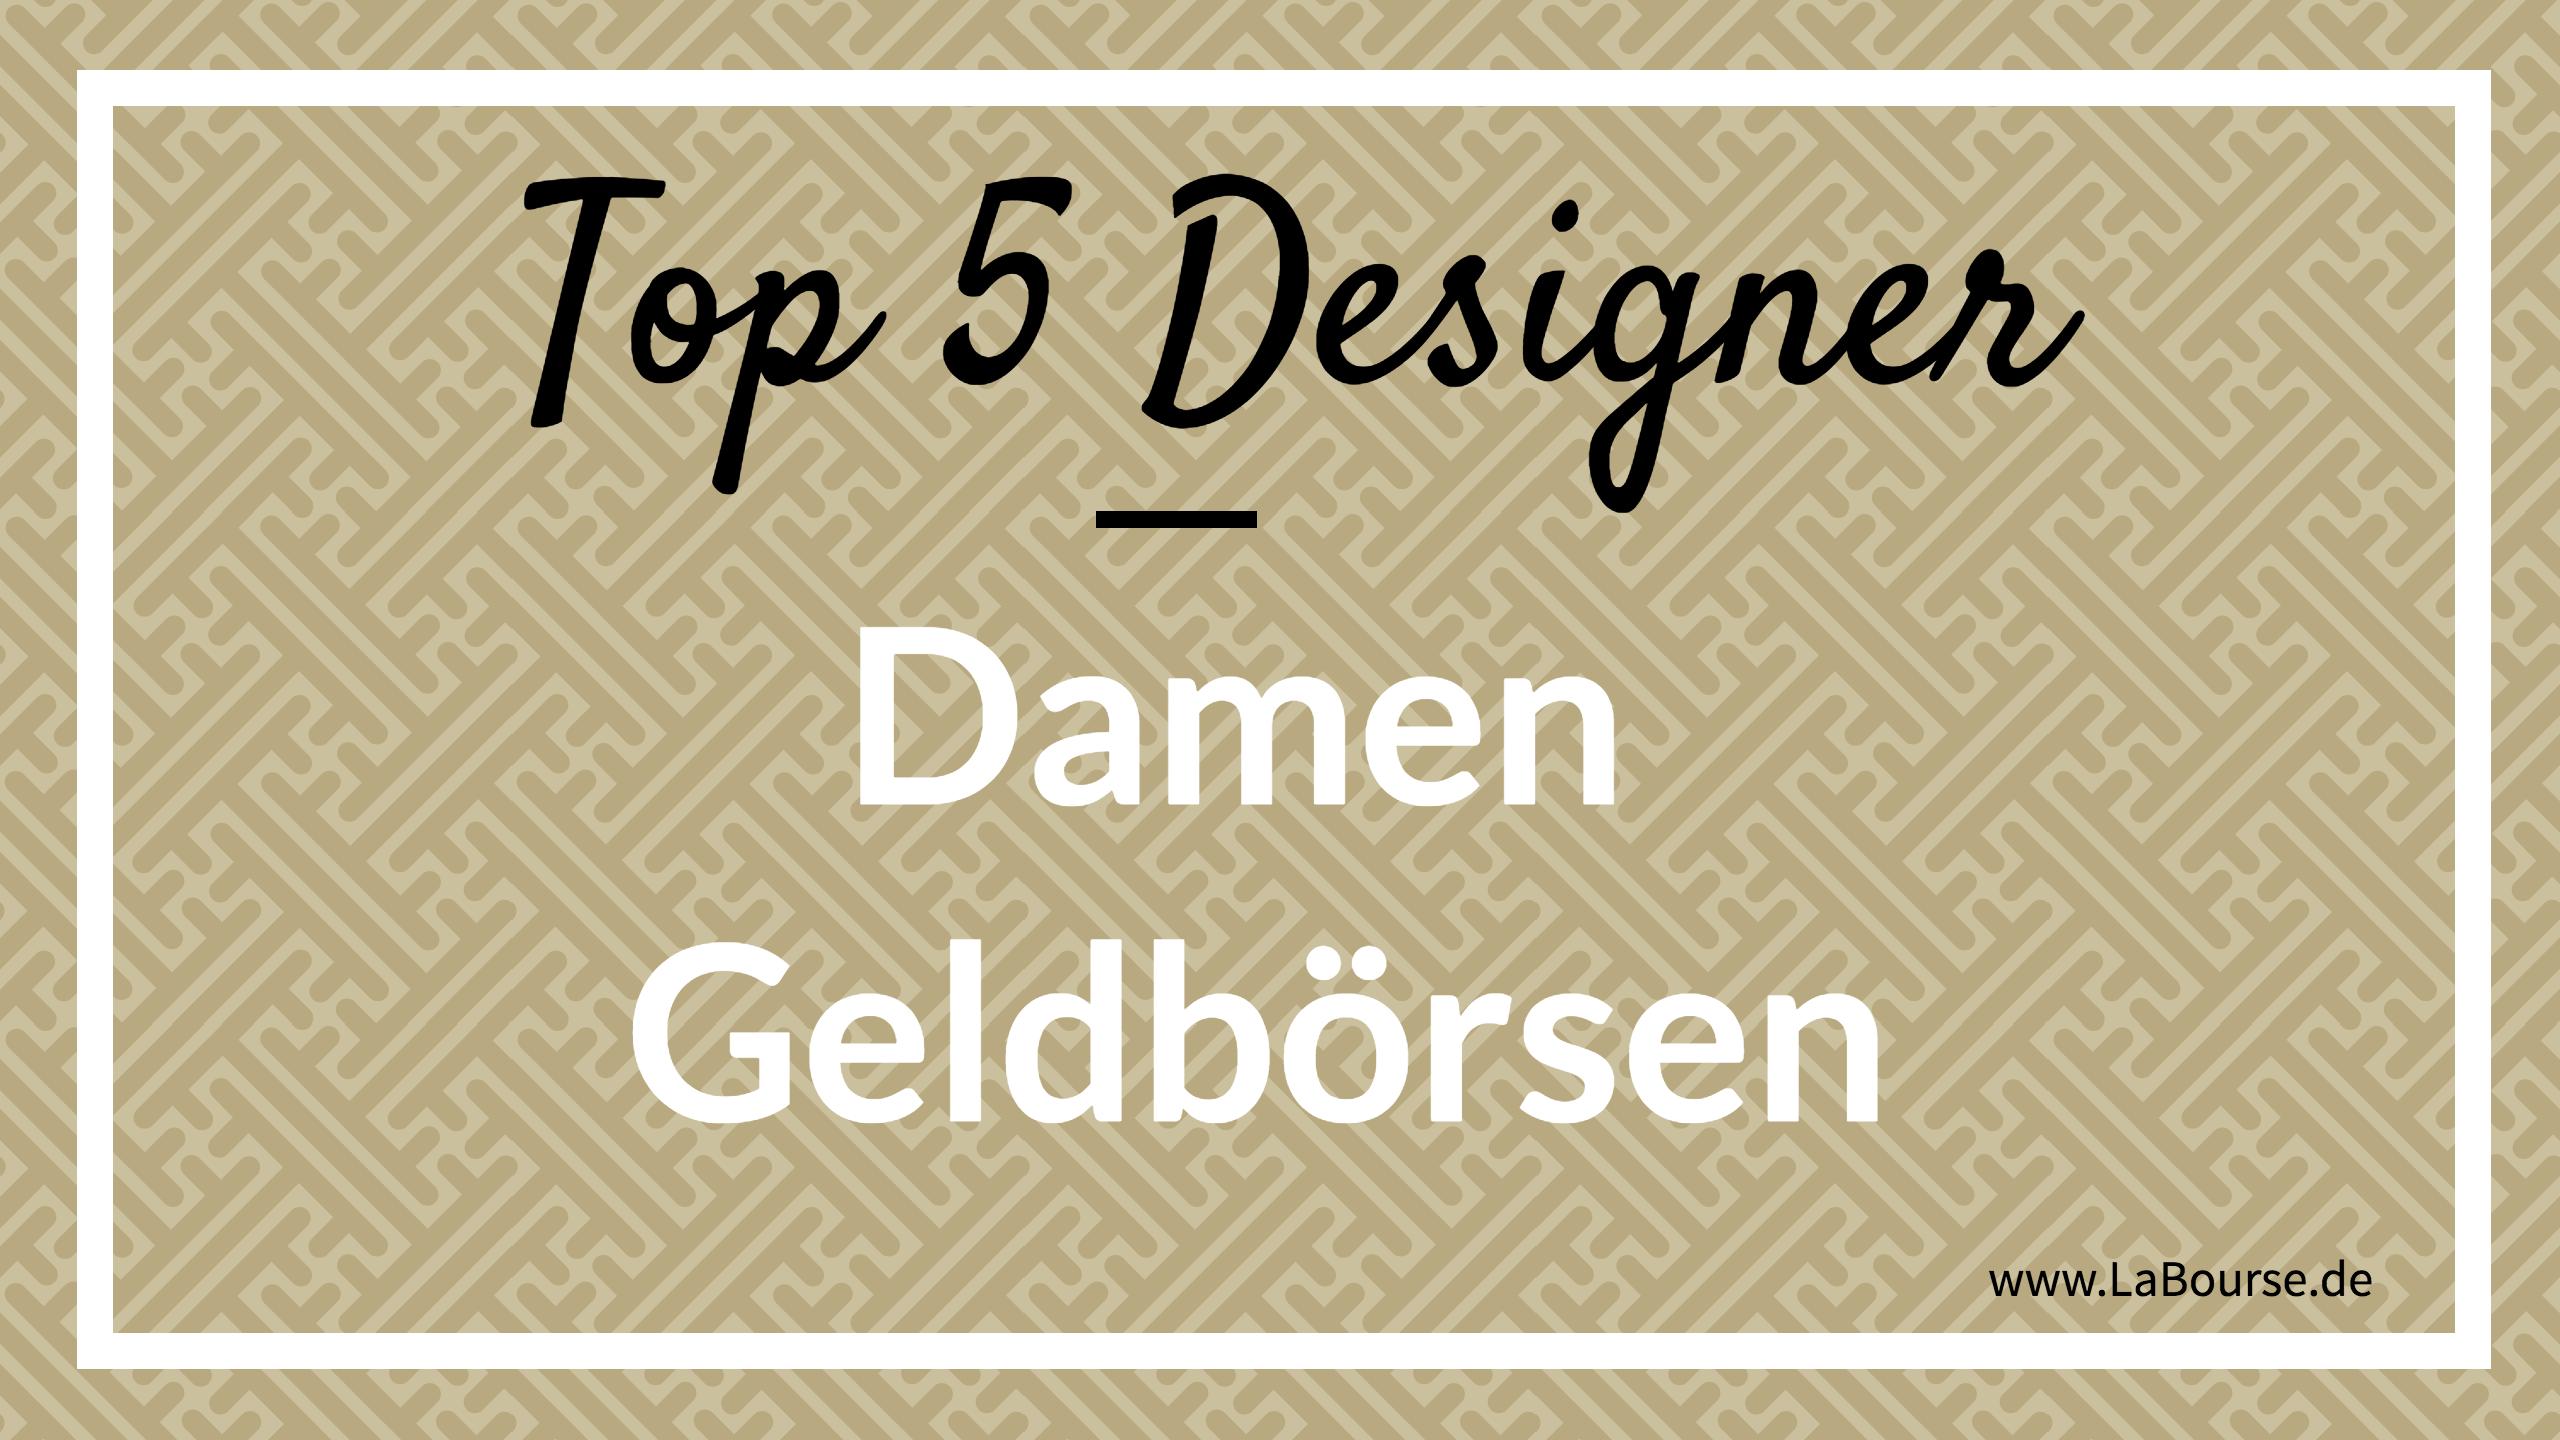 Top 5 Designer Damen Geldbörsen